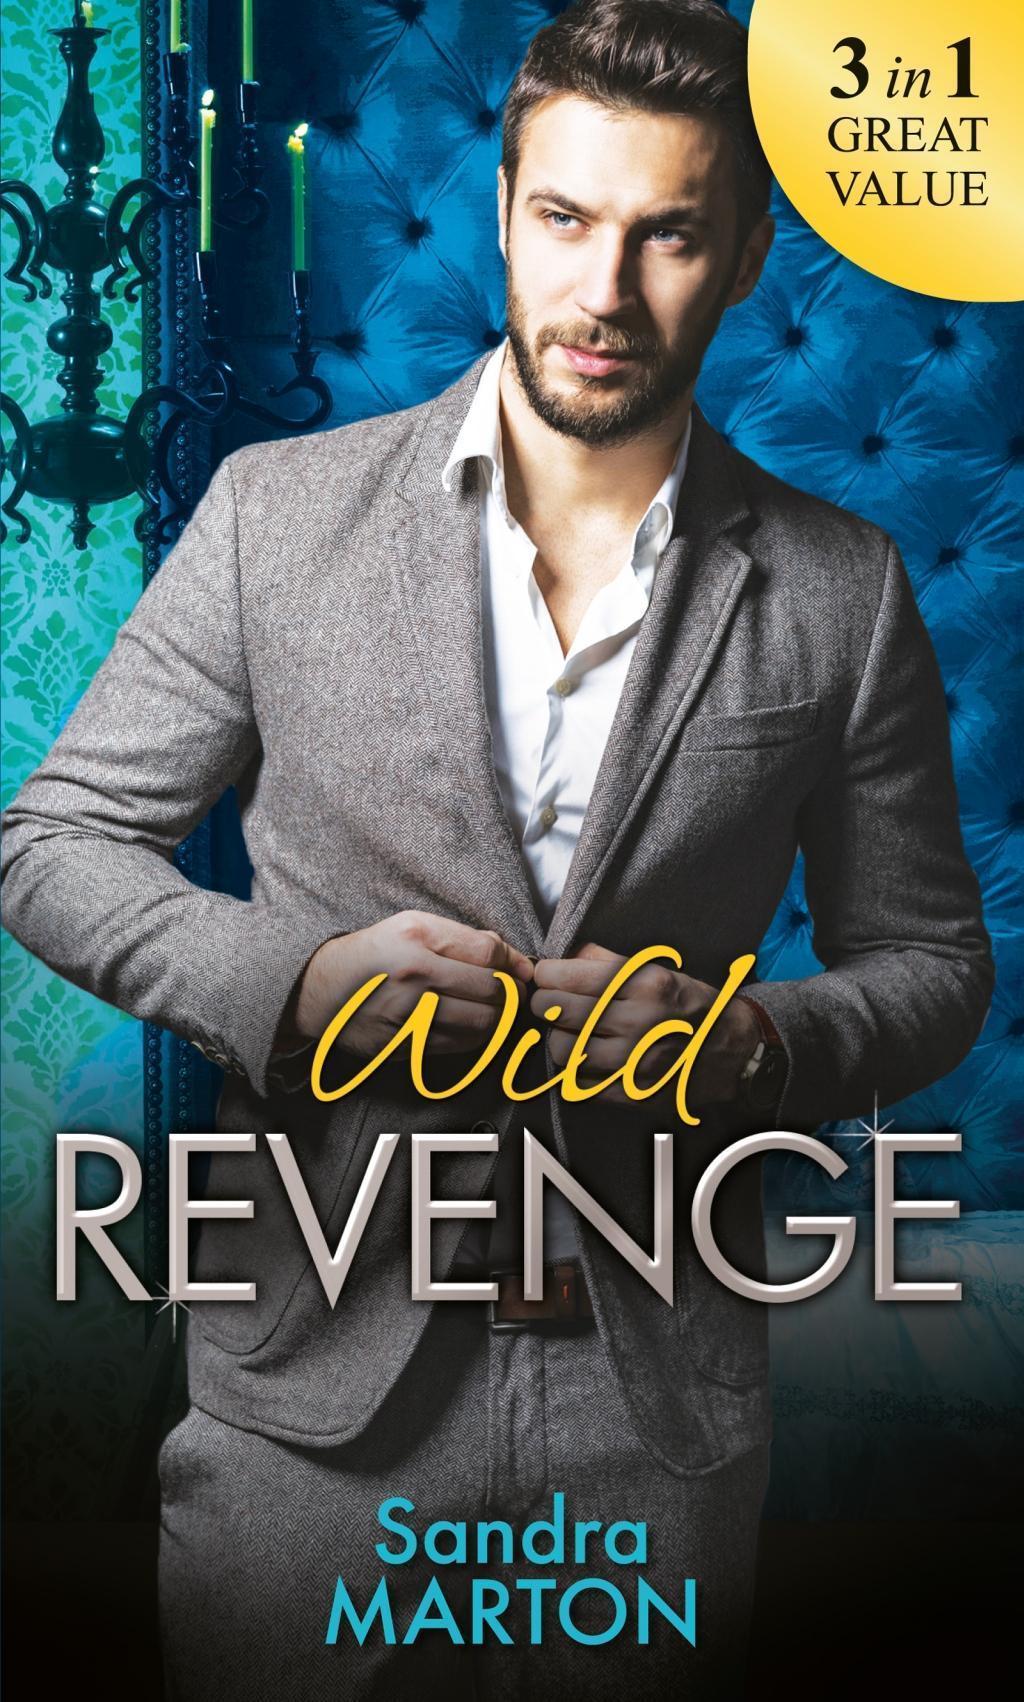 Wild Revenge: The Dangerous Jacob Wilde / The Ruthless Caleb Wilde / The Merciless Travis Wilde (Mills & Boon M&B)